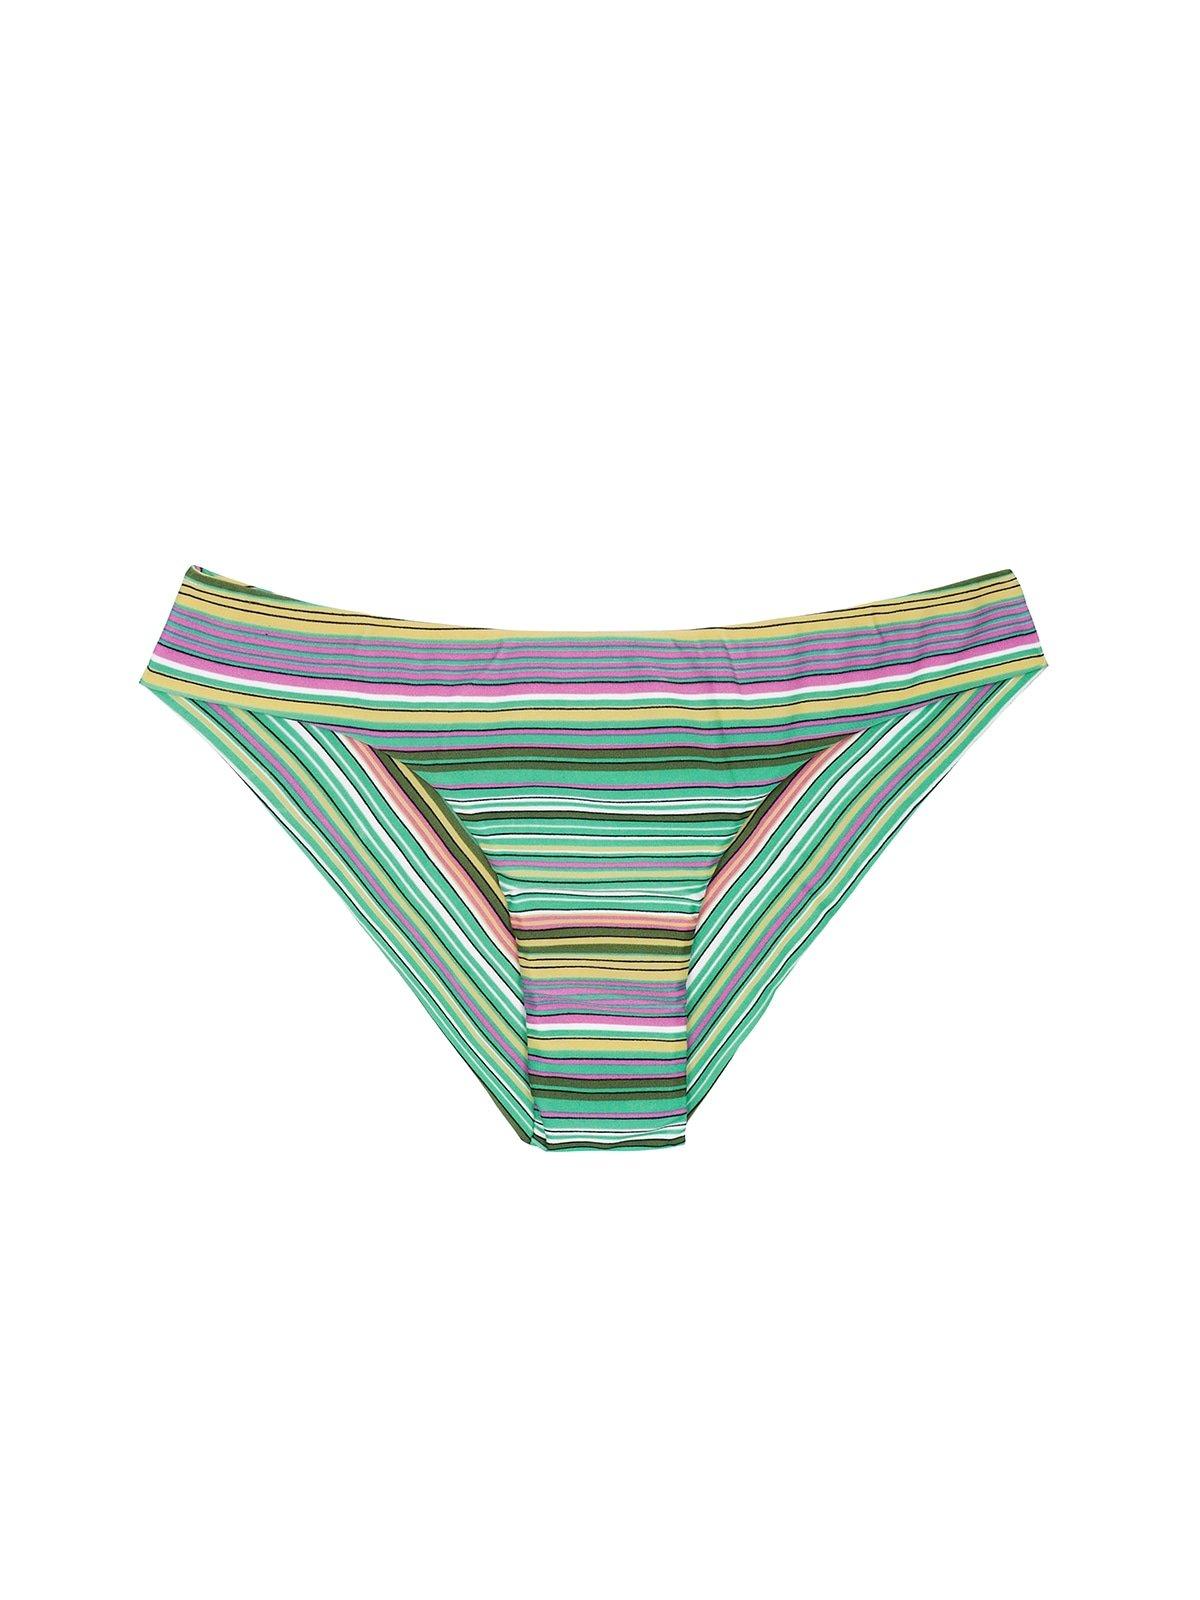 Green Striped Brazilian Bikini Bottom - Calcinha Iemanja Sporty